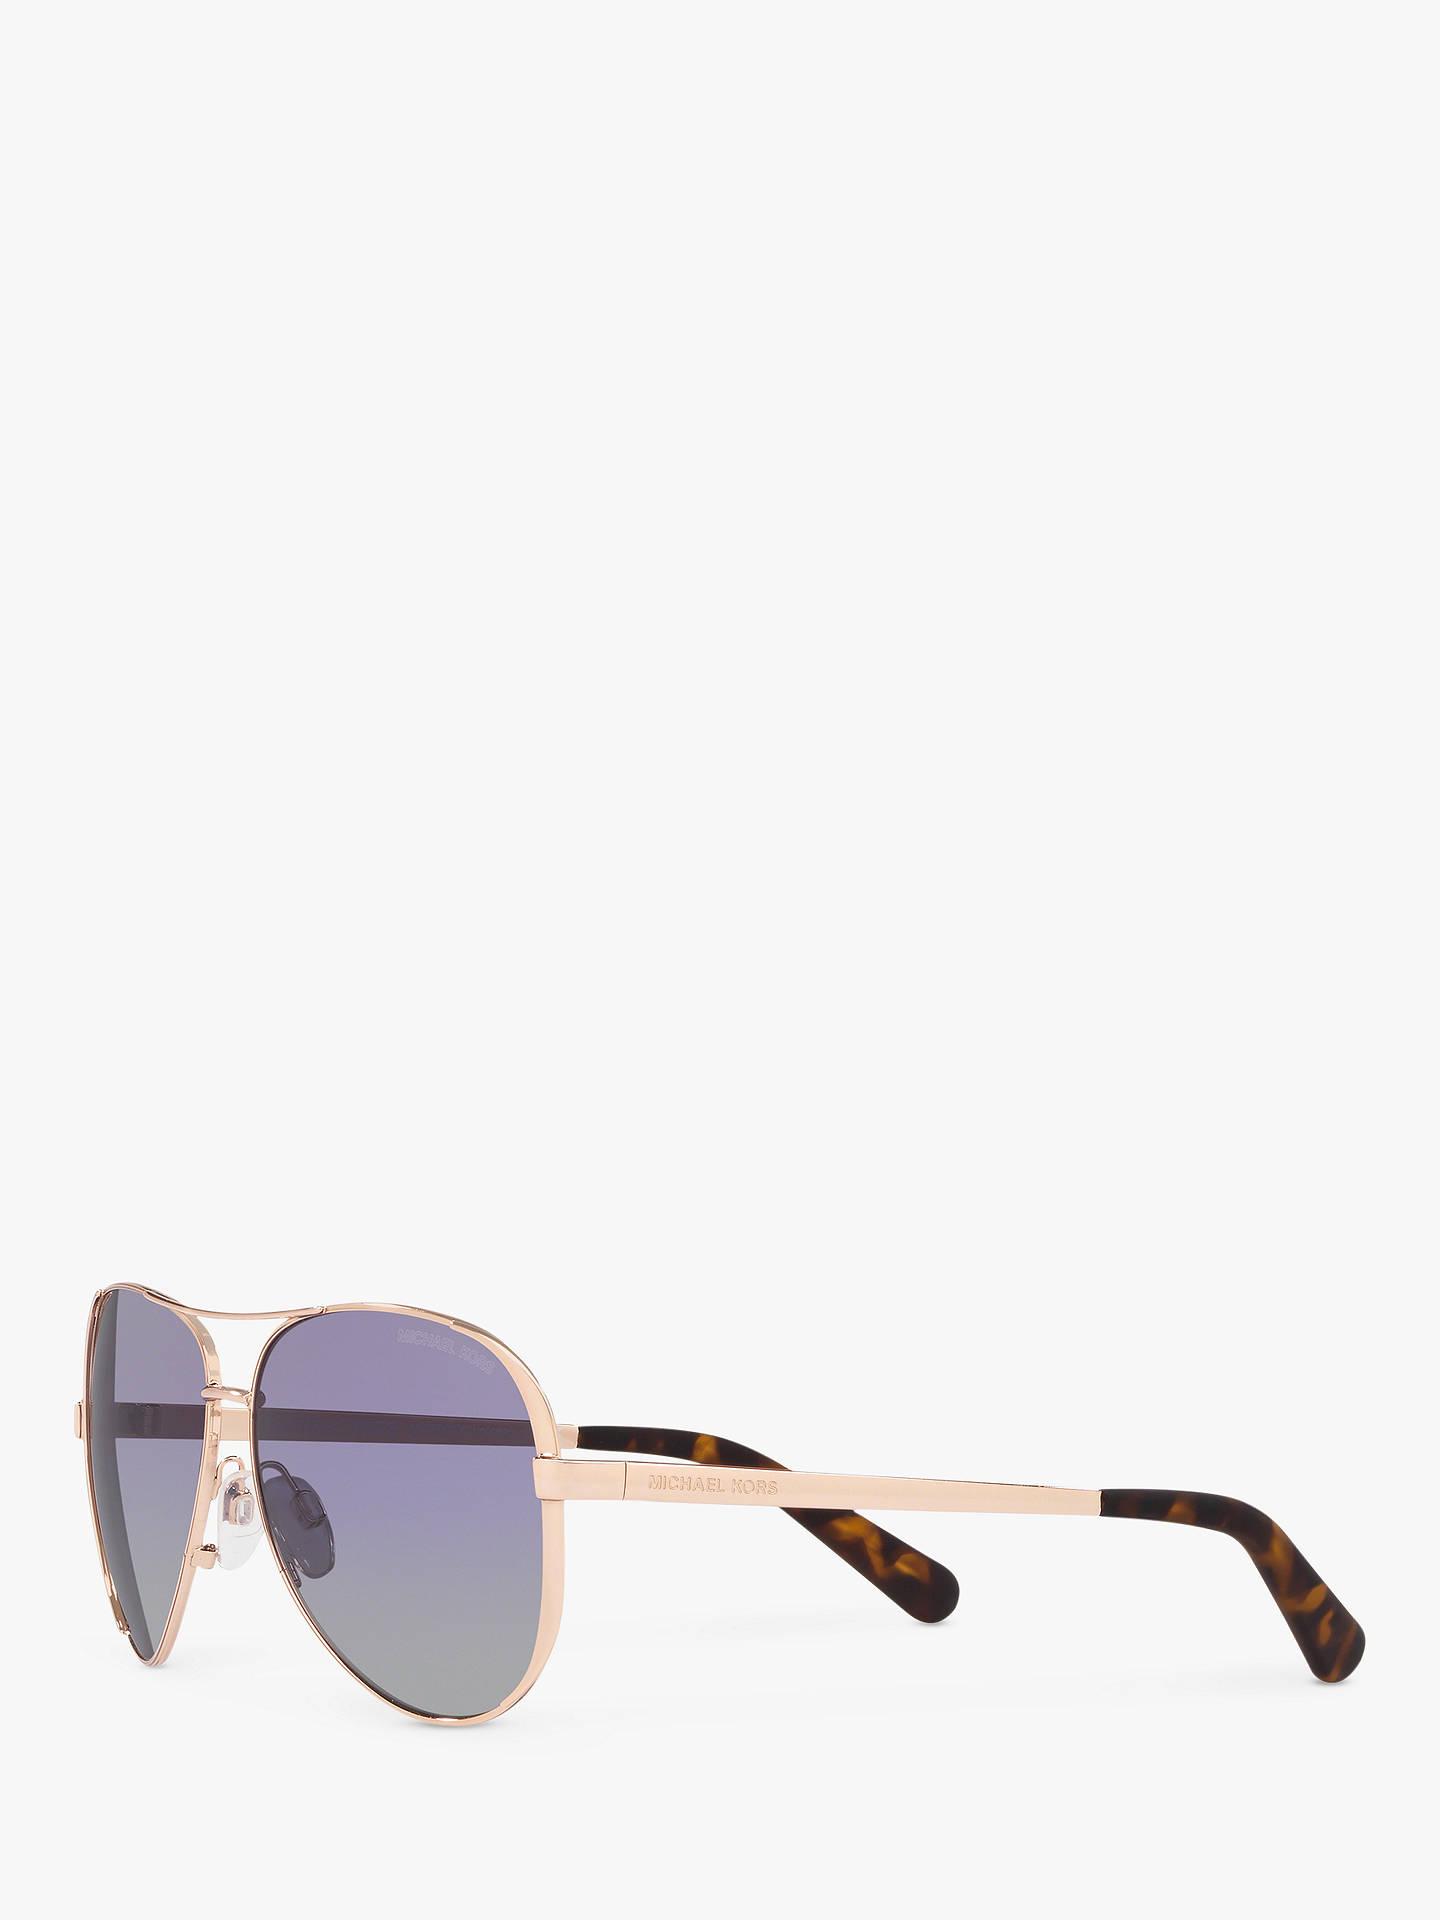 27e44a44a Buy Michael Kors MK5004 Chelsea Polarised Aviator Sunglasses, Rose Gold/ Purple Online at johnlewis ...